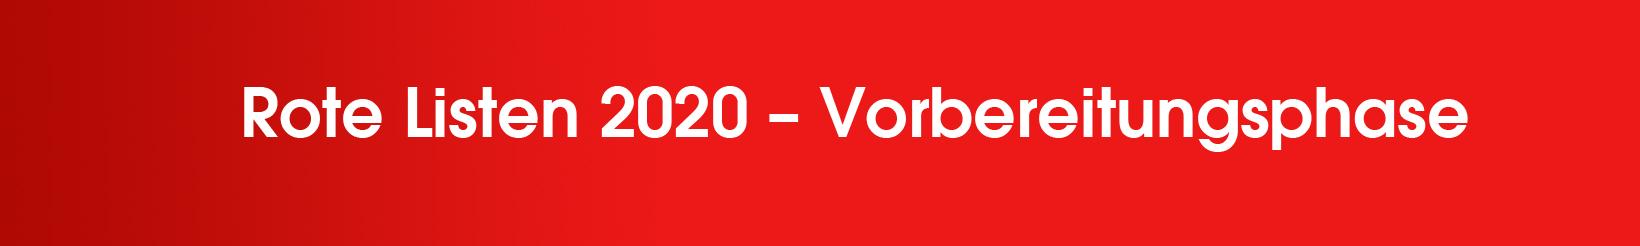 rotelisten2020.bgbm.org